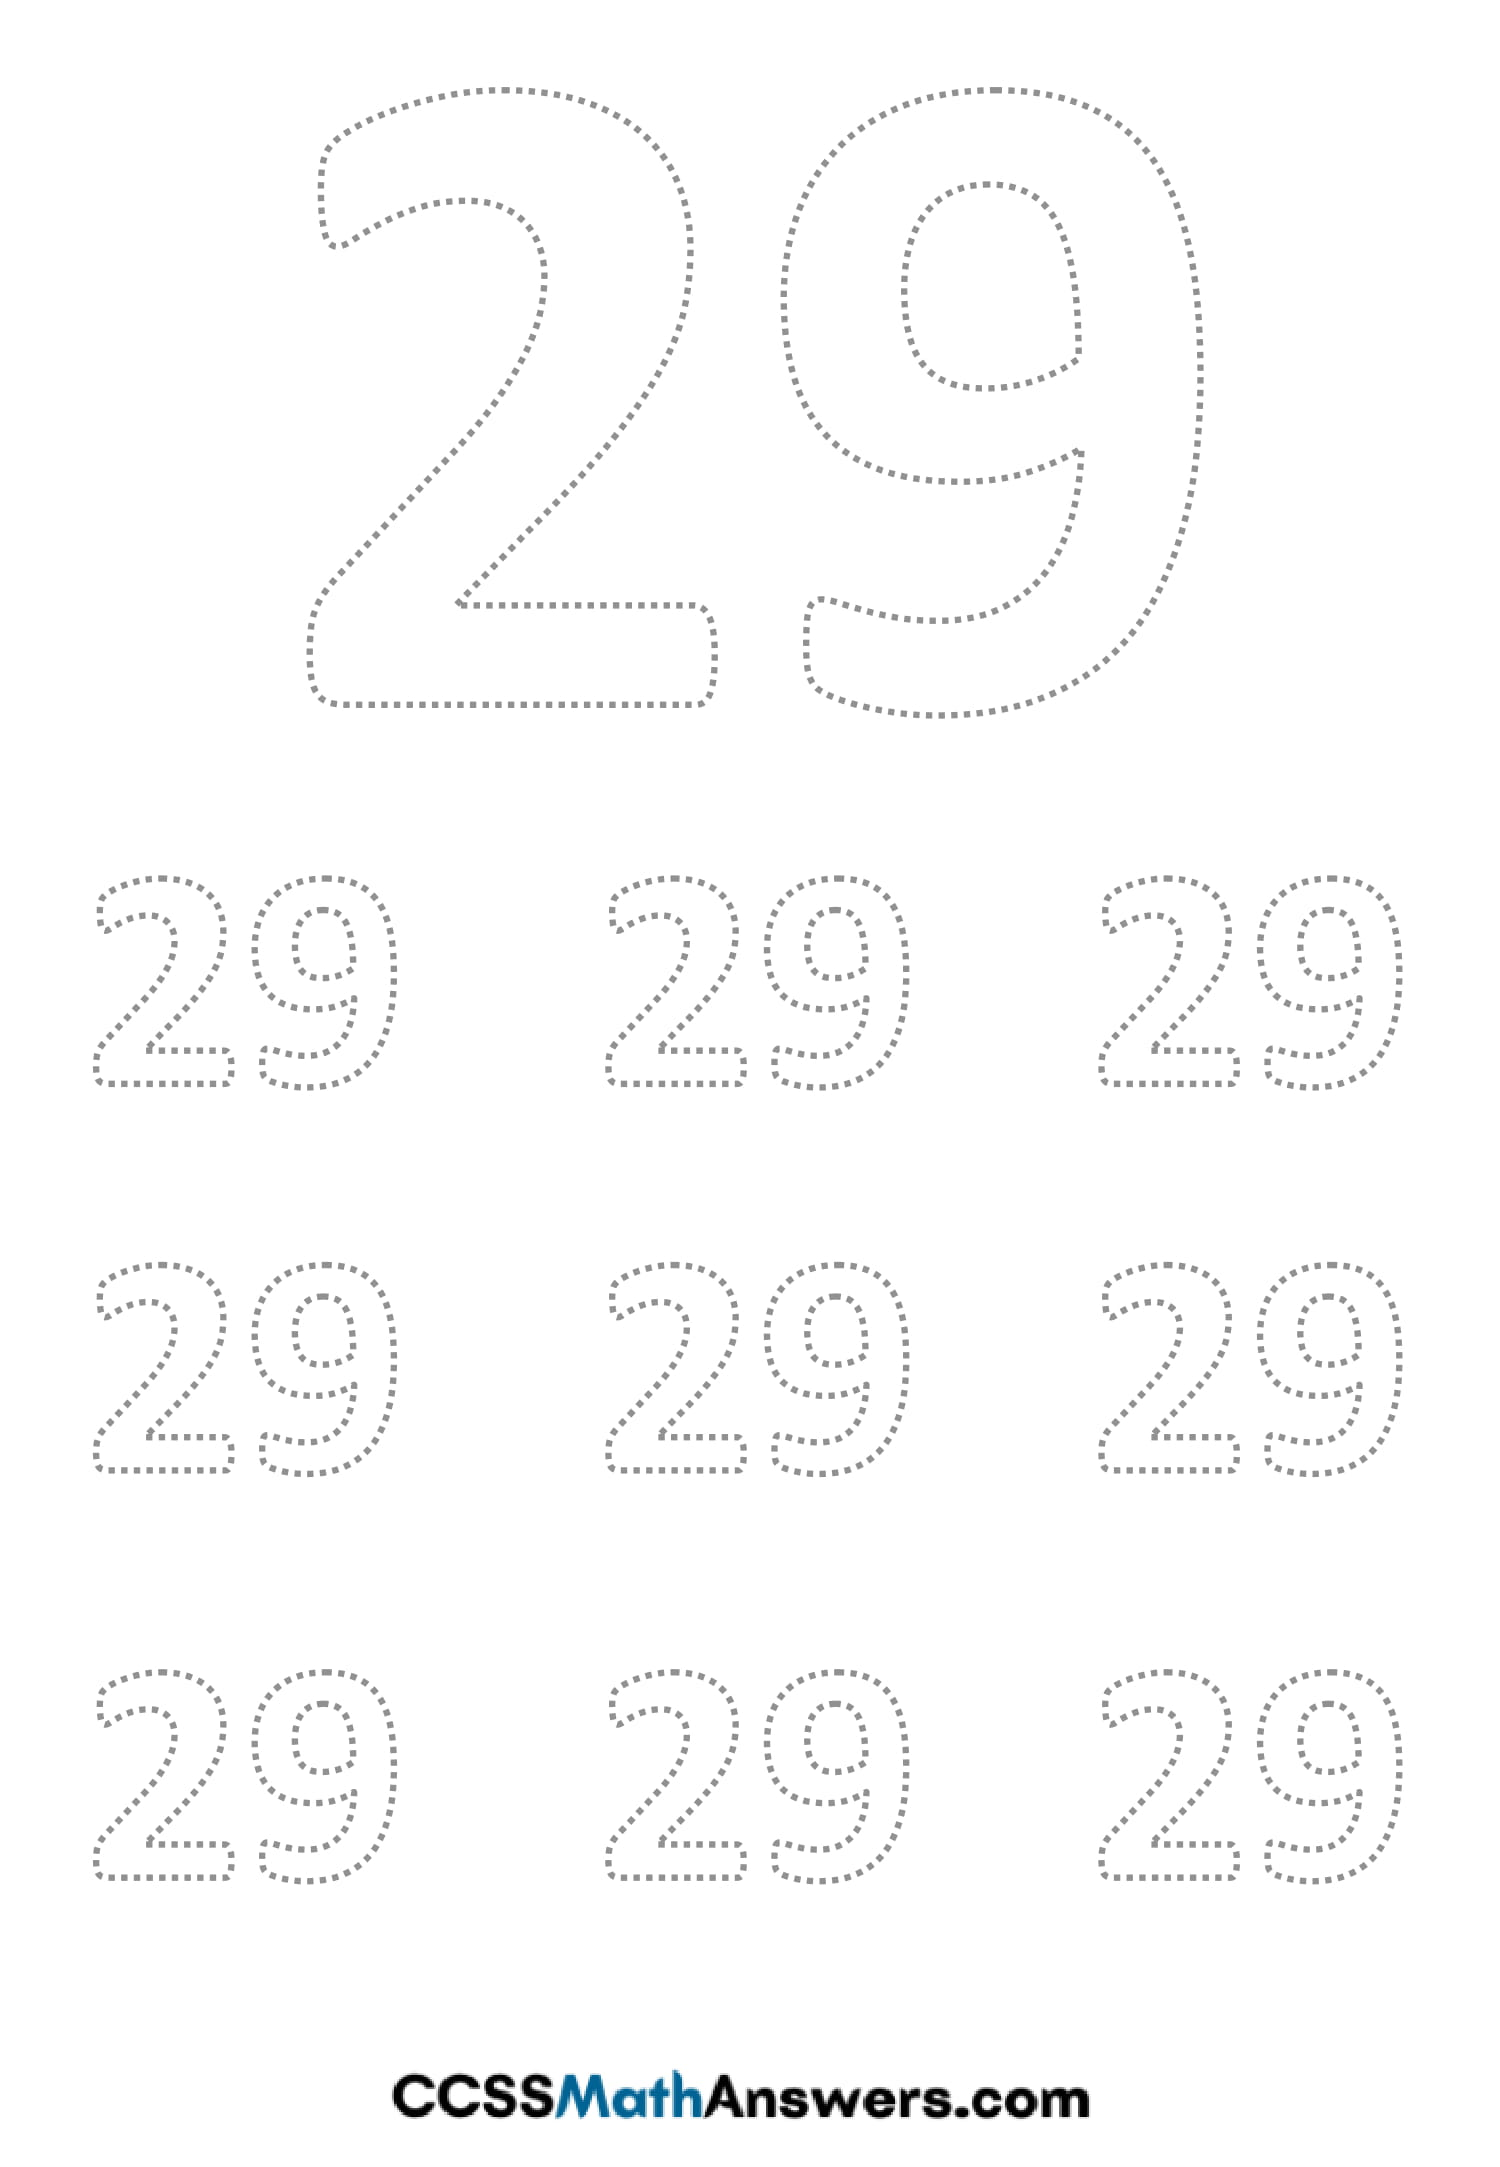 Worksheet on Number Twenty Nine